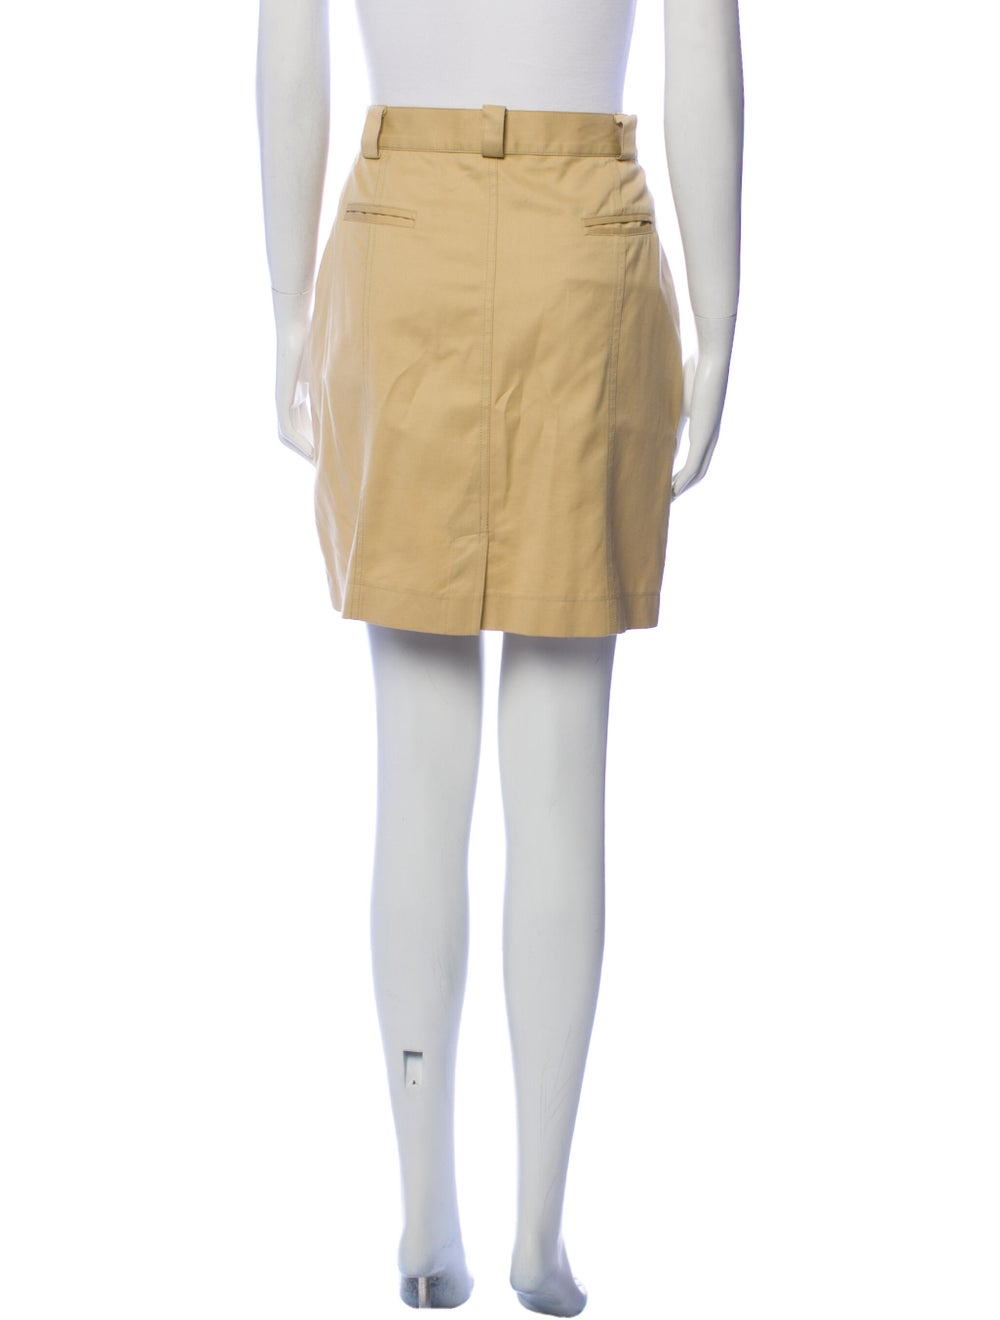 Escada Sport Mini Skirt - image 3